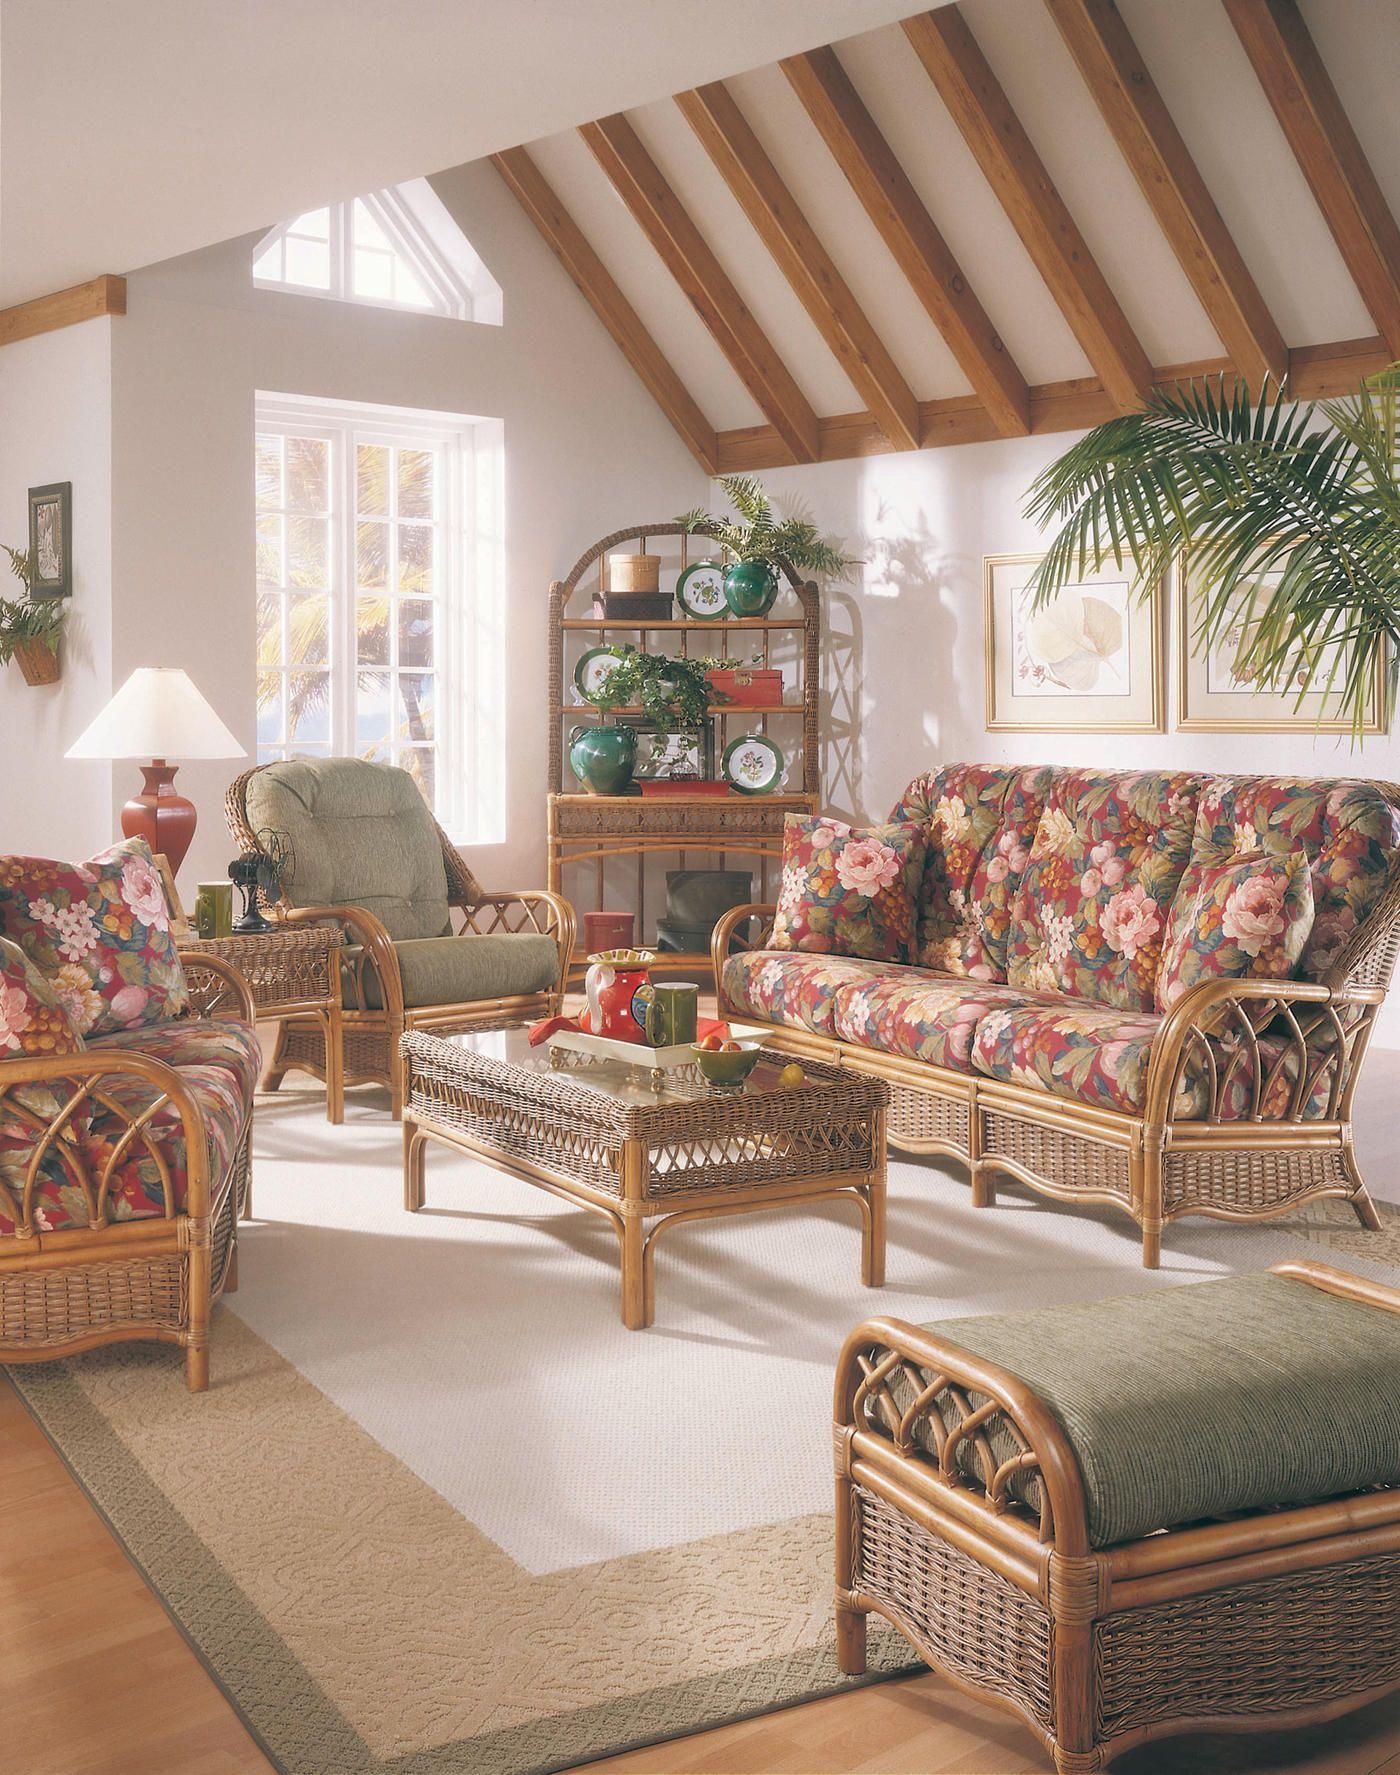 11 Cool Braxton Culler Wicker Furniture Designer Ideas